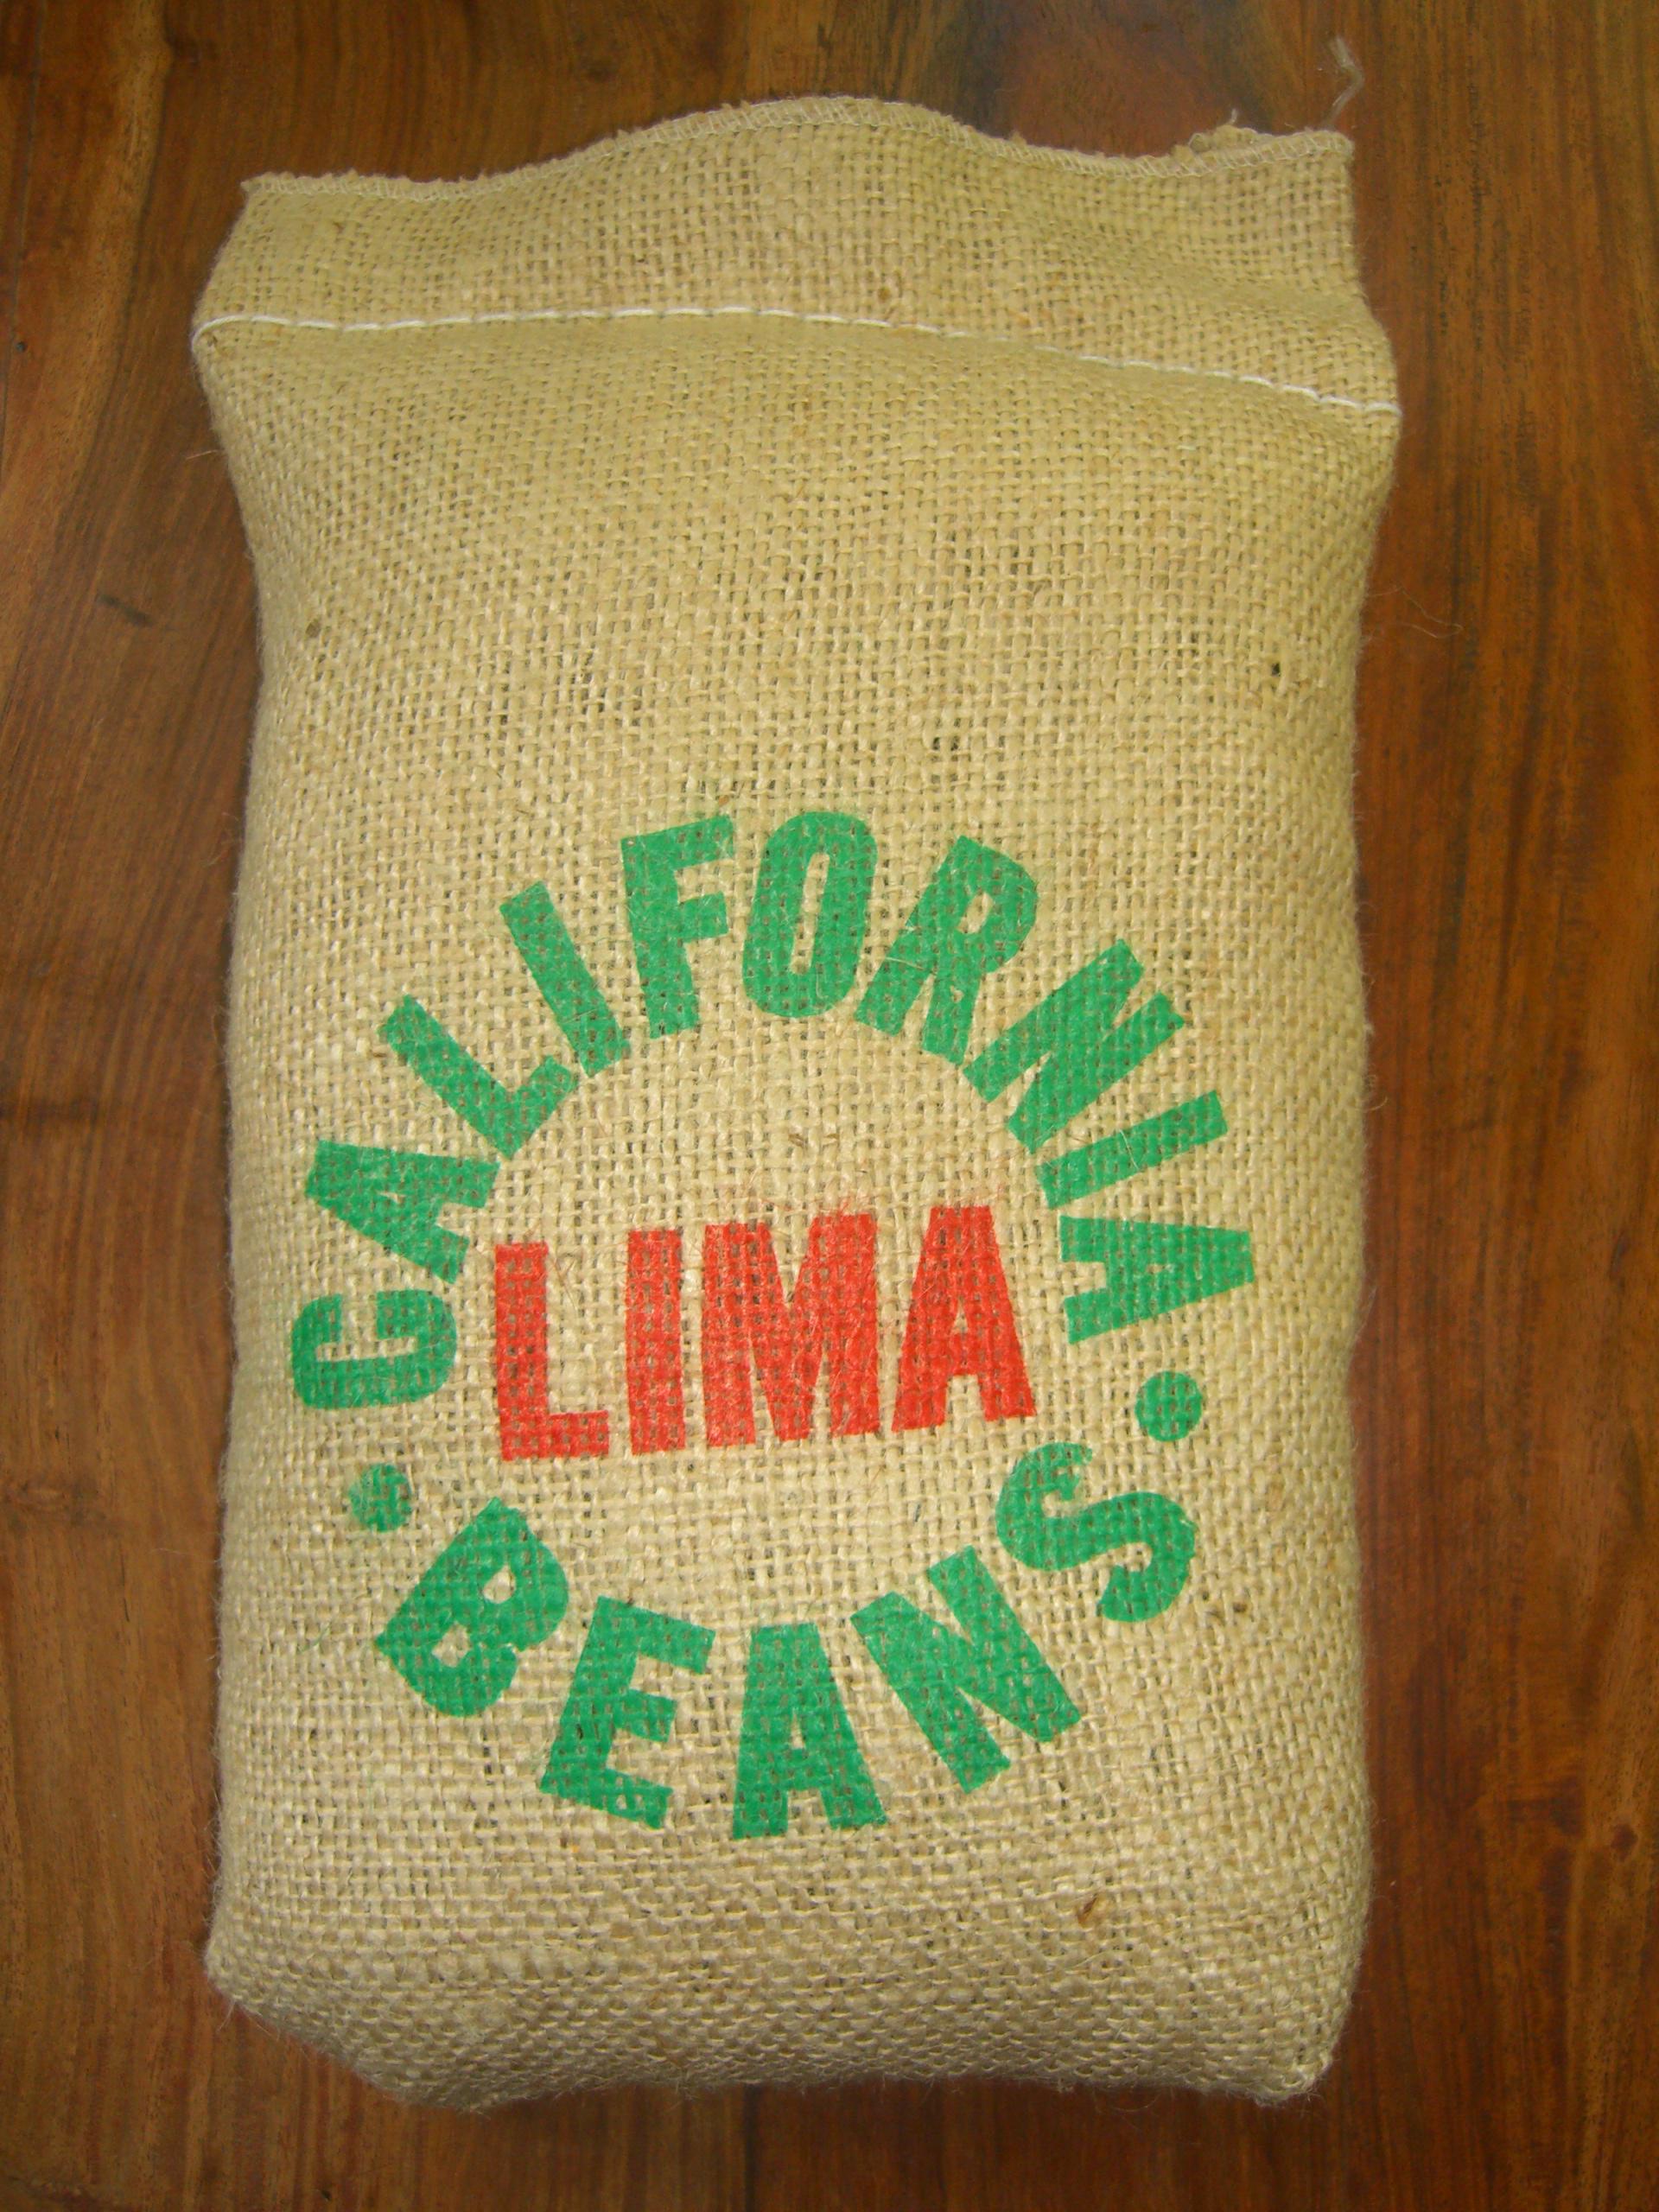 Segerstrom Lima Beans